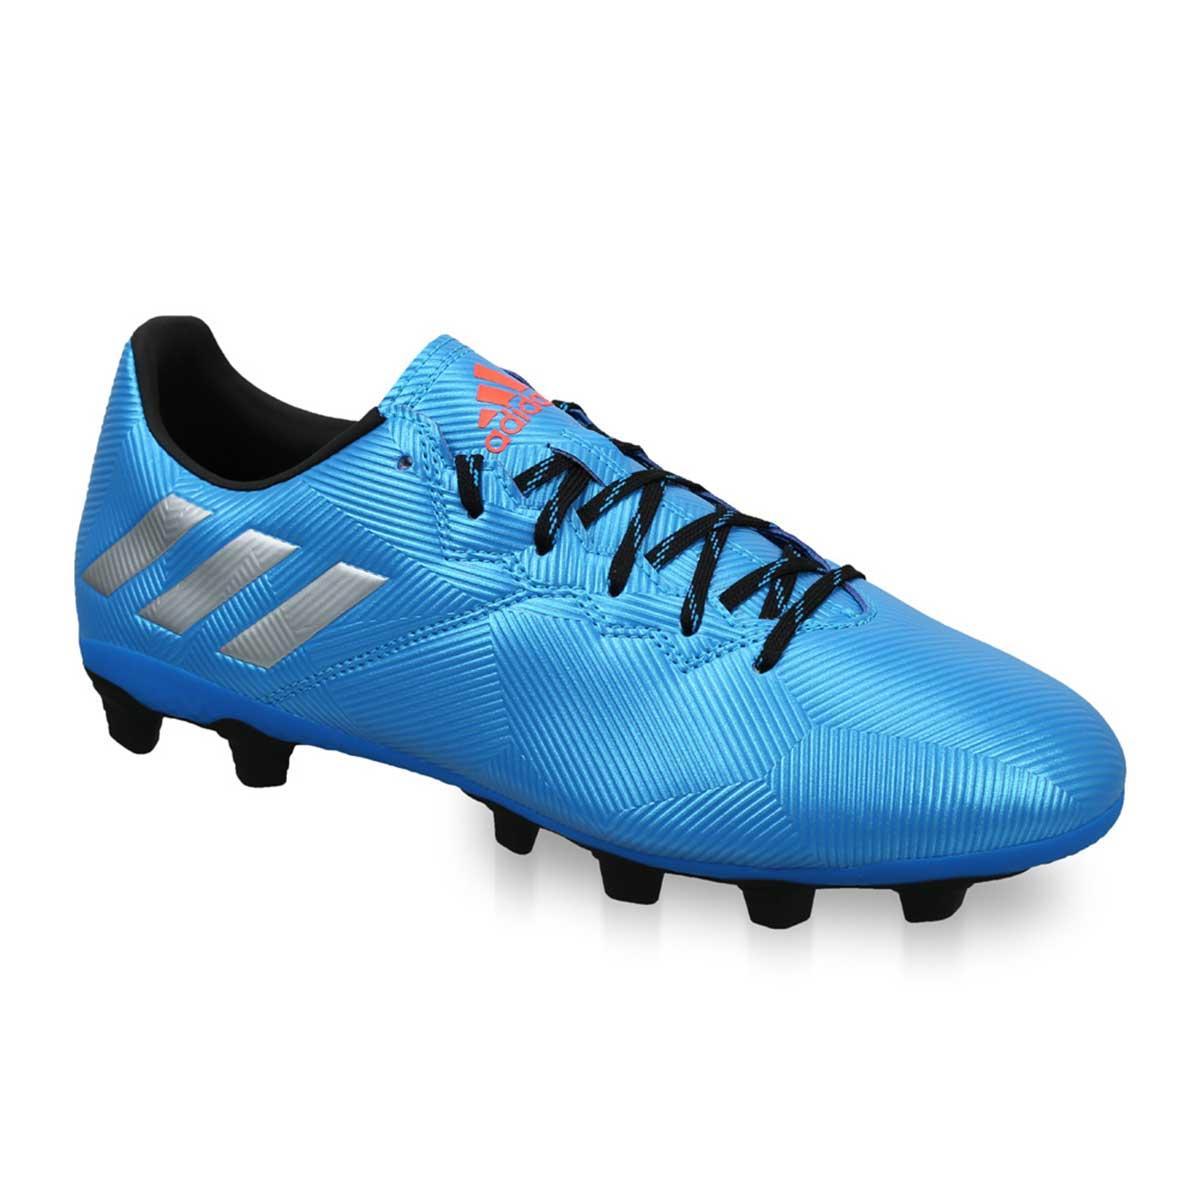 Adidas Messi 16.4 FXG Football Shoes (Blue/Silver/Black)